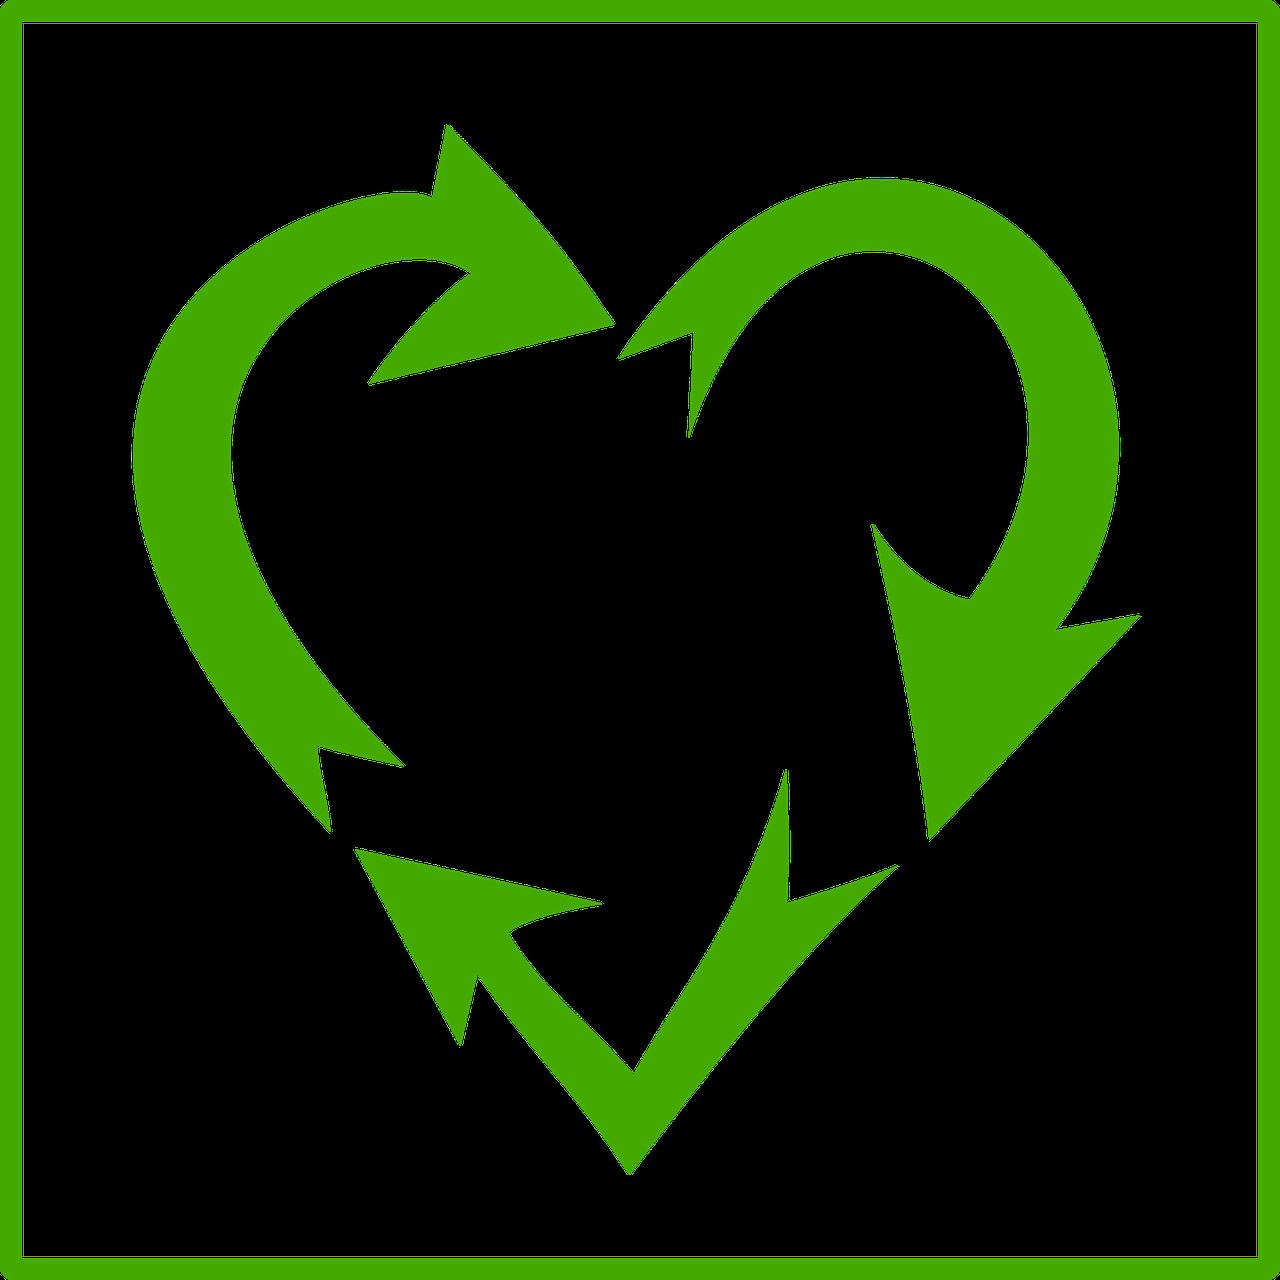 Kilcock rubbish removal and waste disposal